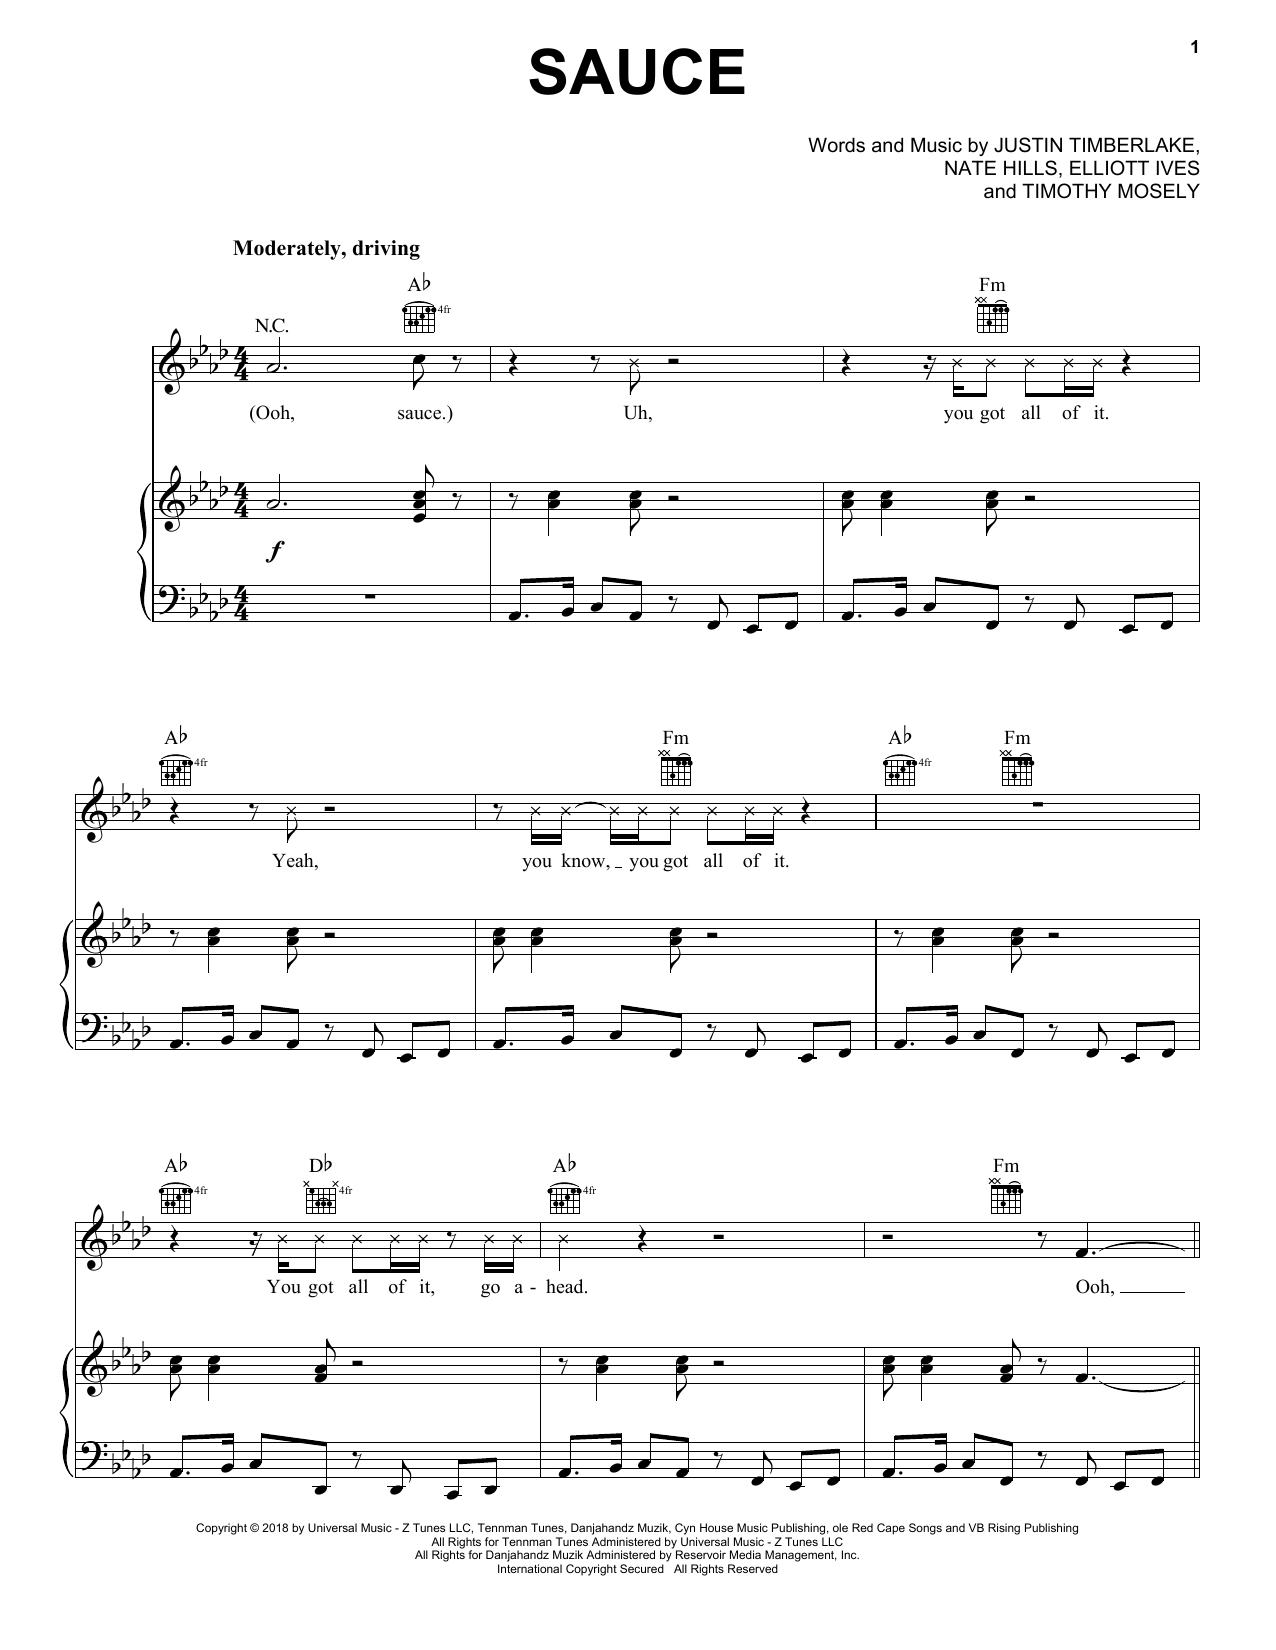 Justin Timberlake Sauce sheet music notes and chords